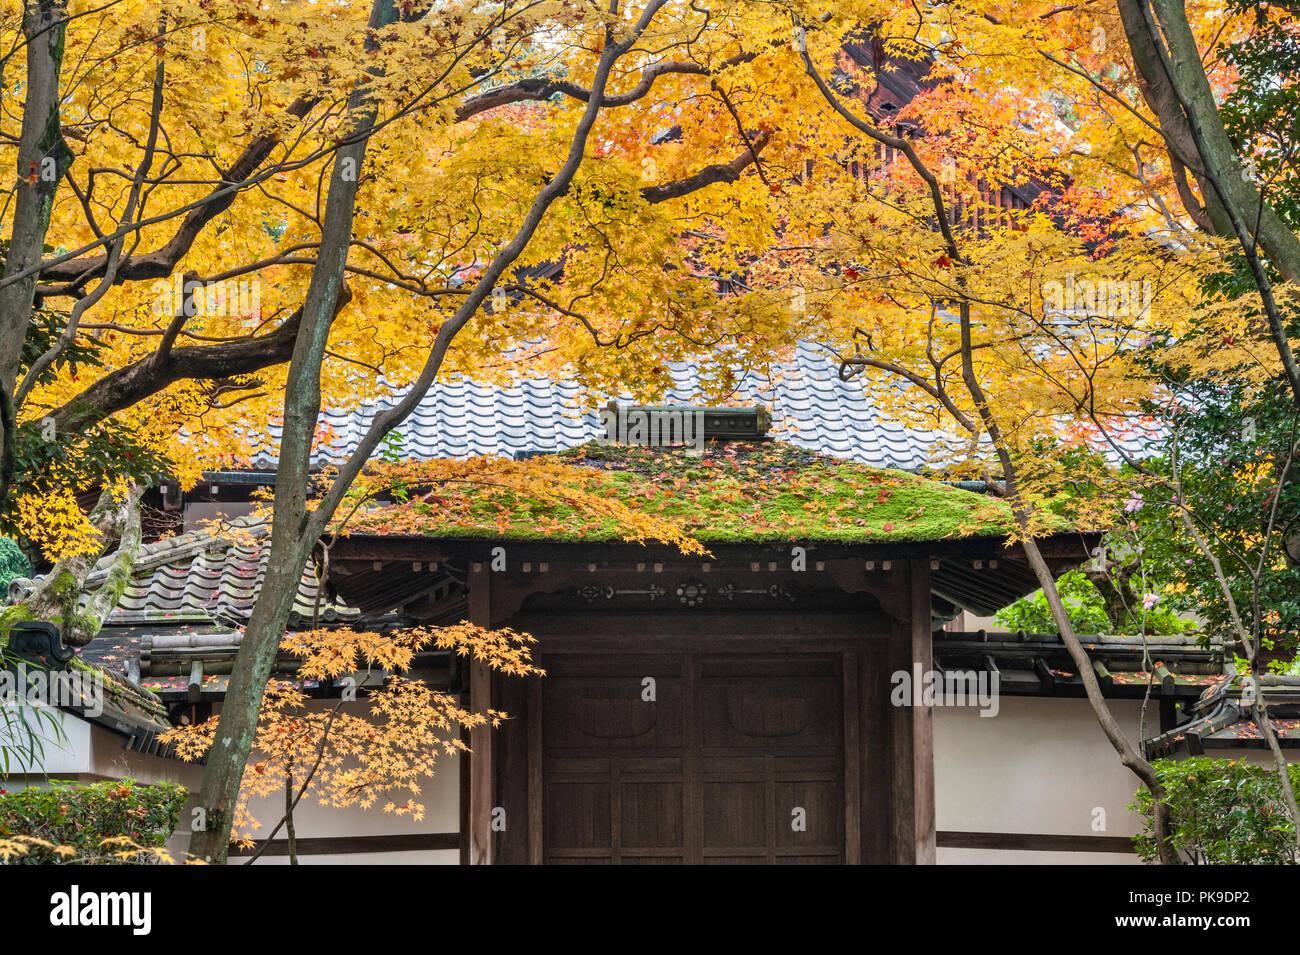 Autumn colour in Japan. Daitoku-ji, Kyoto. Colourful autumn foliage hangs over the gate into Koto-in zen temple - Stock Image